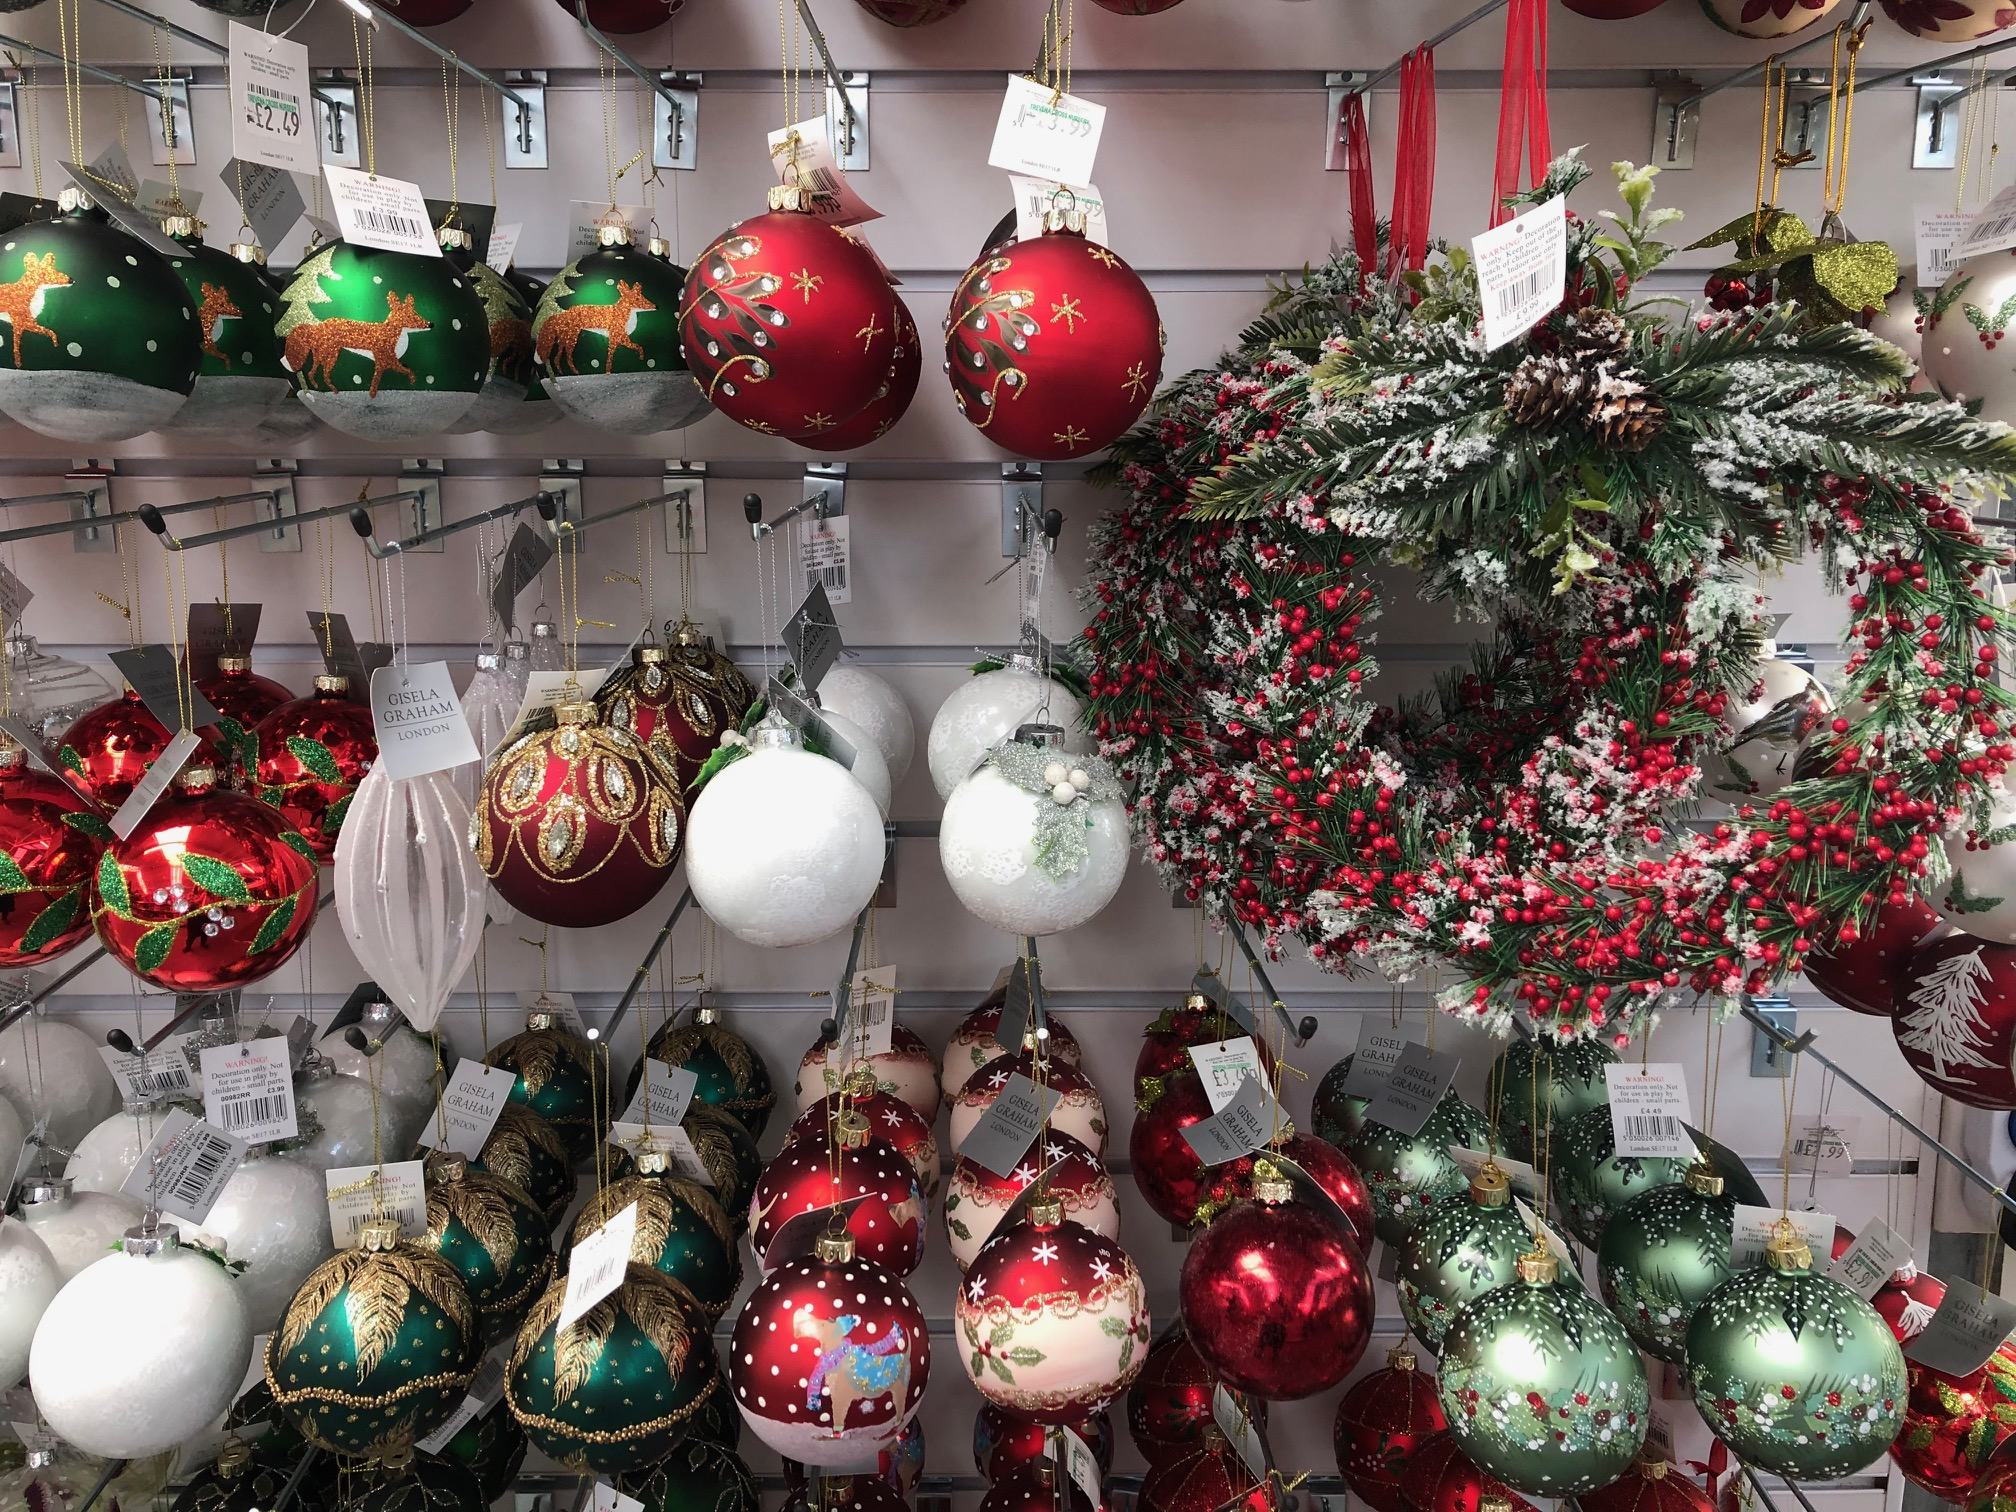 bauble display in Trevena Cross Christmas shop